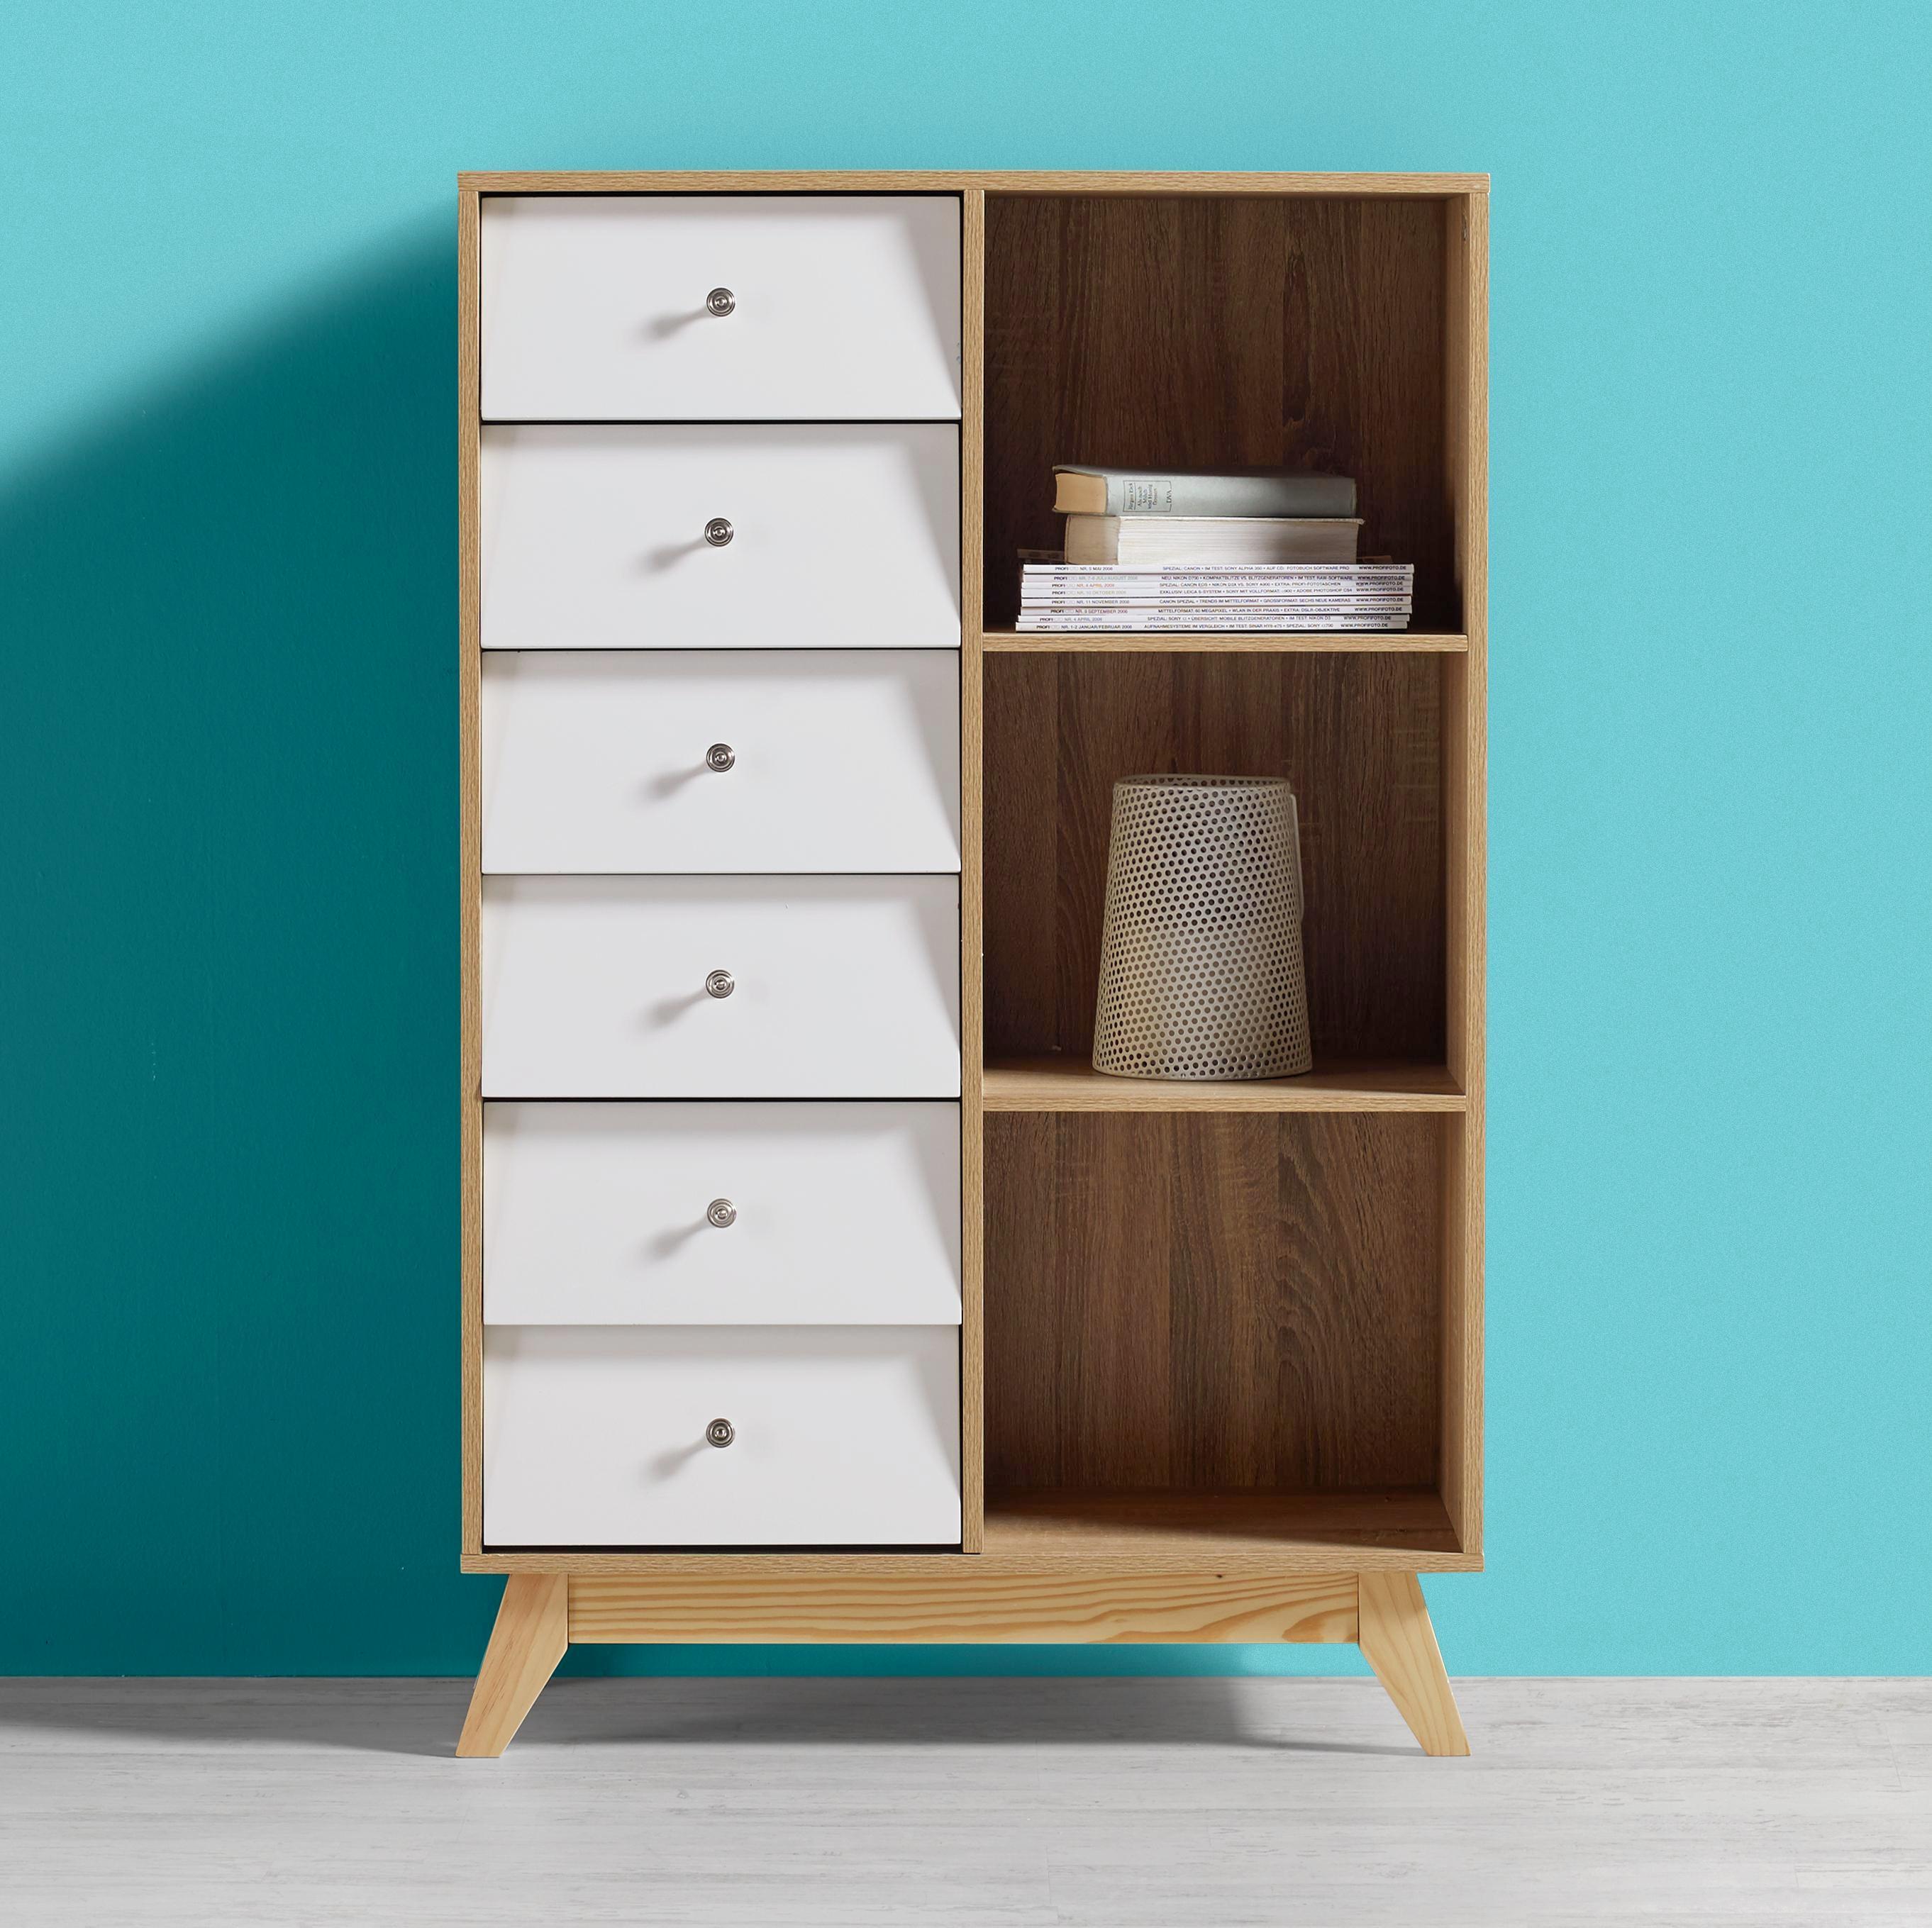 regal 35 cm breit hngeregal wandregal tucuman farbe wenge. Black Bedroom Furniture Sets. Home Design Ideas